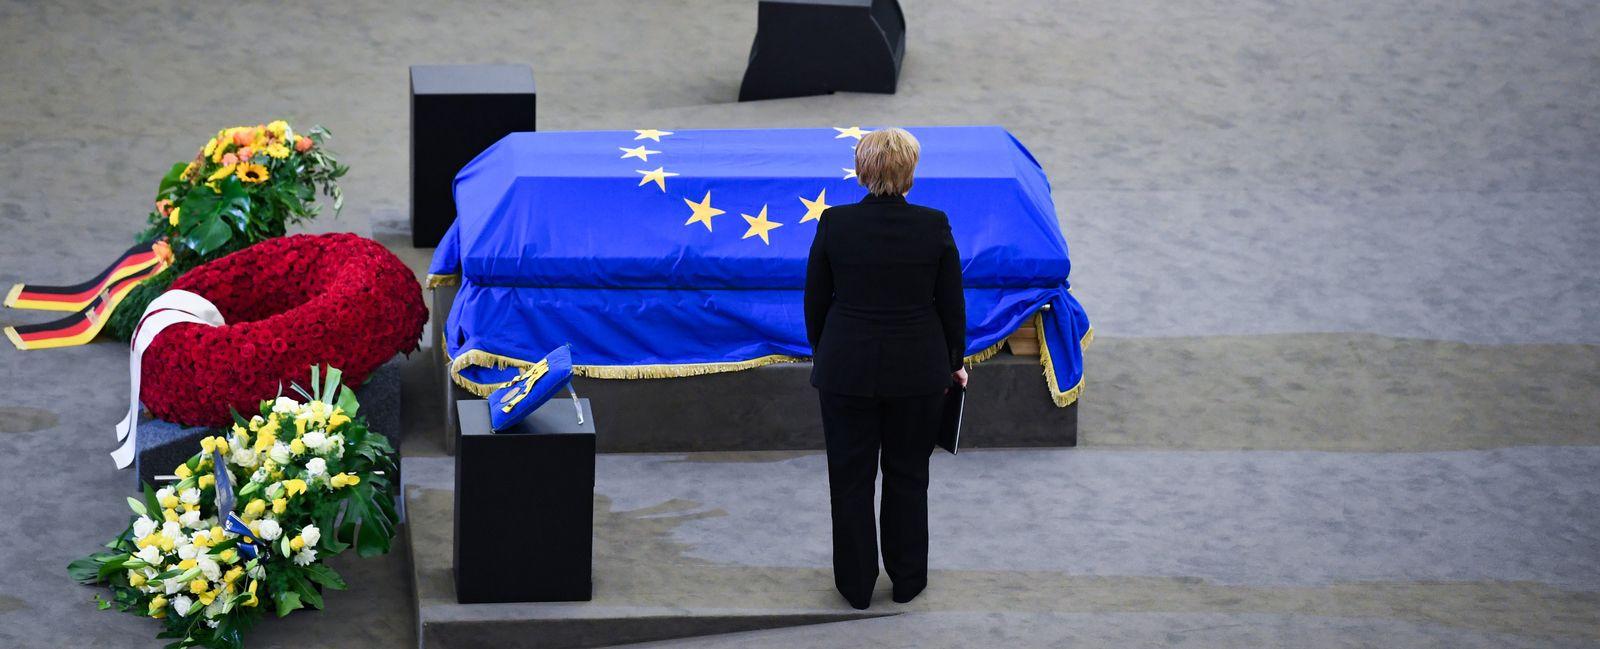 Helmut Kohl/ Trauerfeier/ Begräbnis